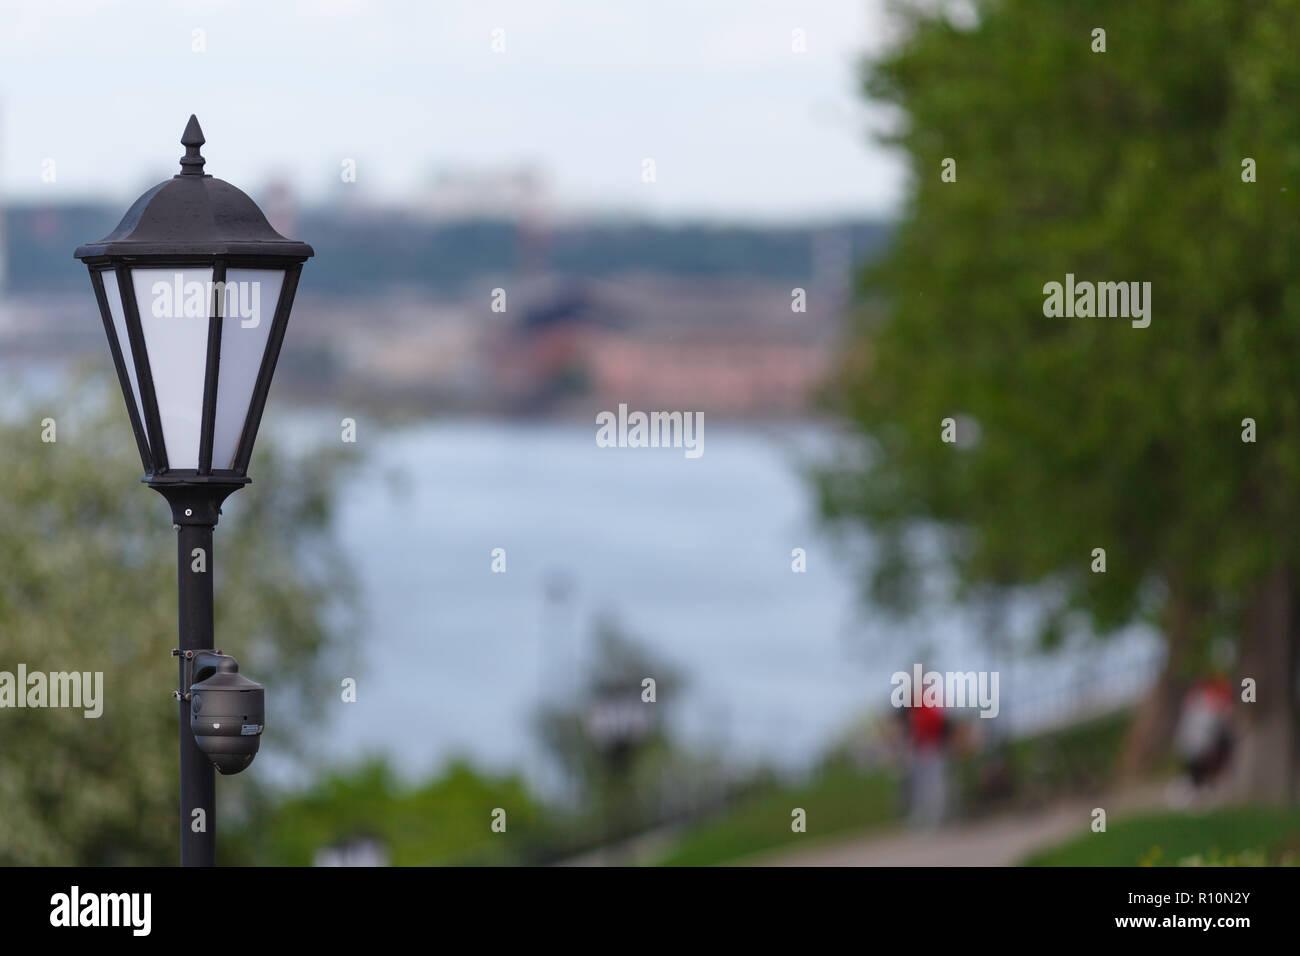 CCTV surveillance camera mounted on vintage street lantern - Stock Image